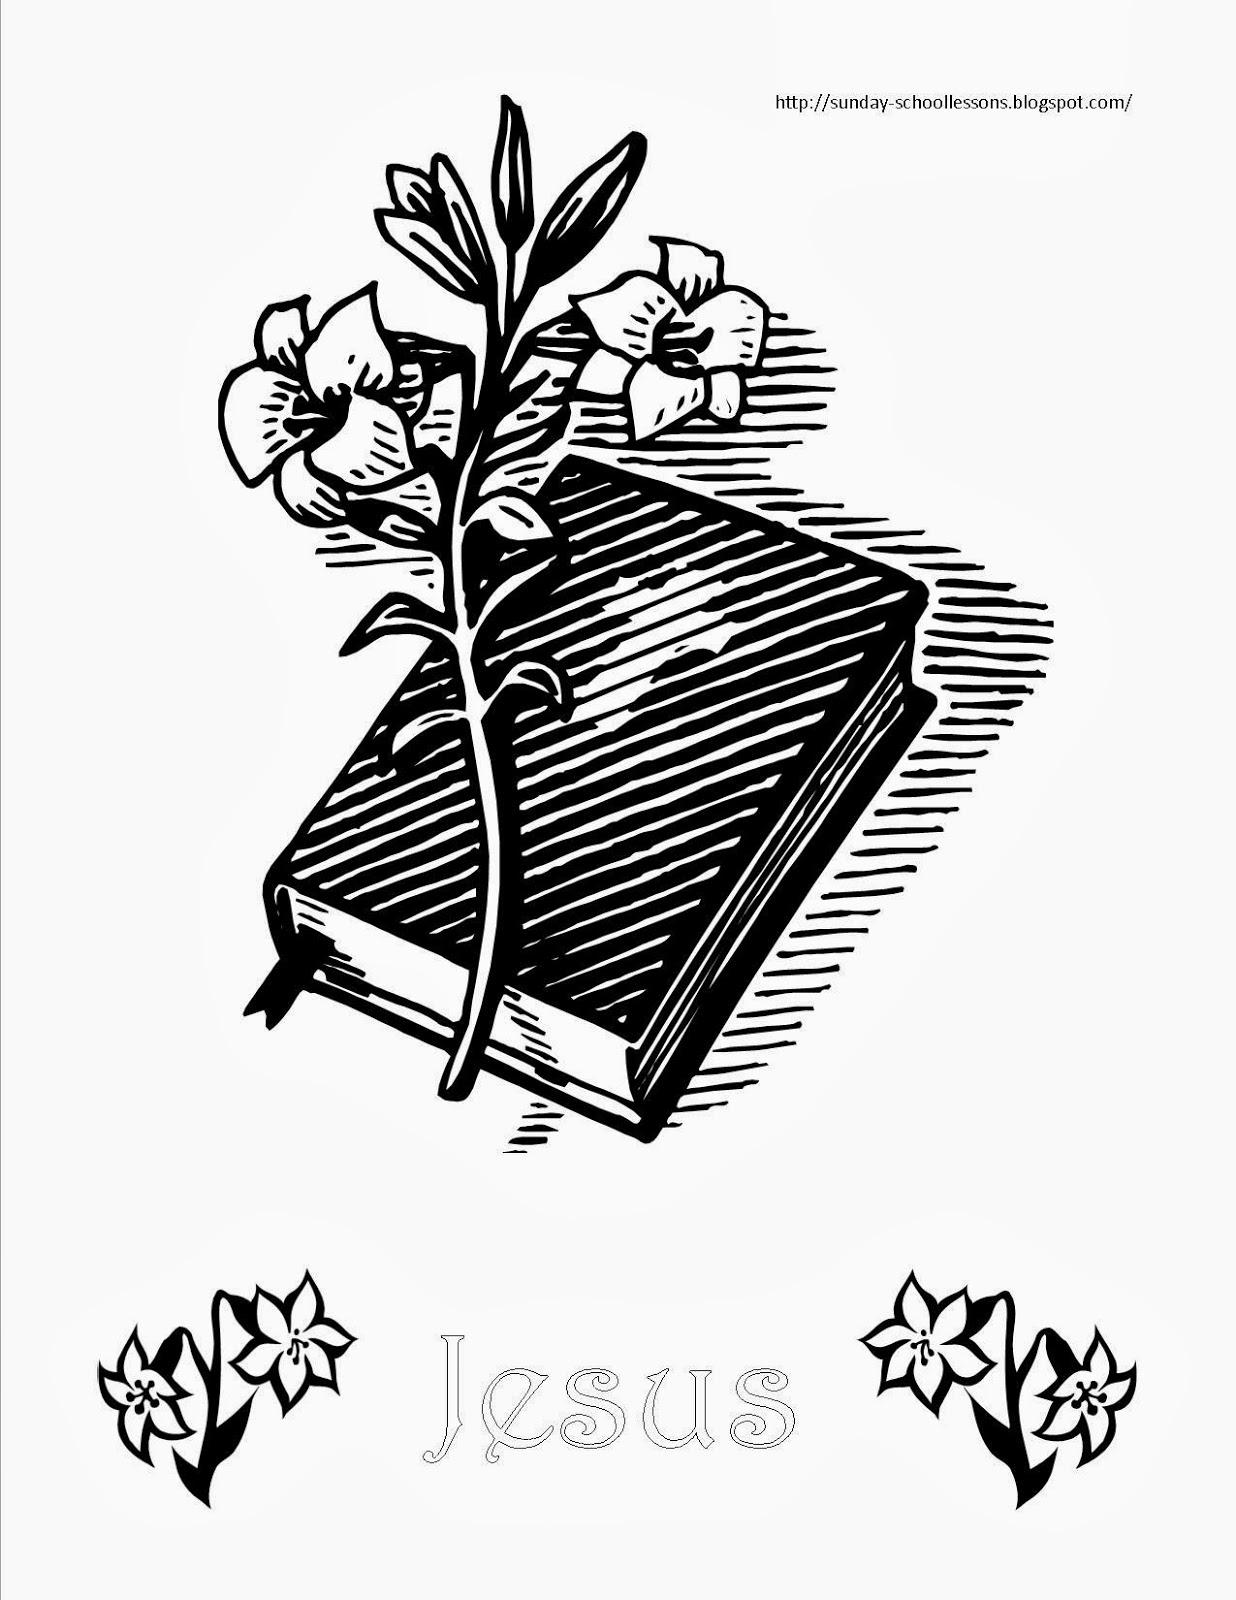 Sunday School Lessons of Plenty: Easter